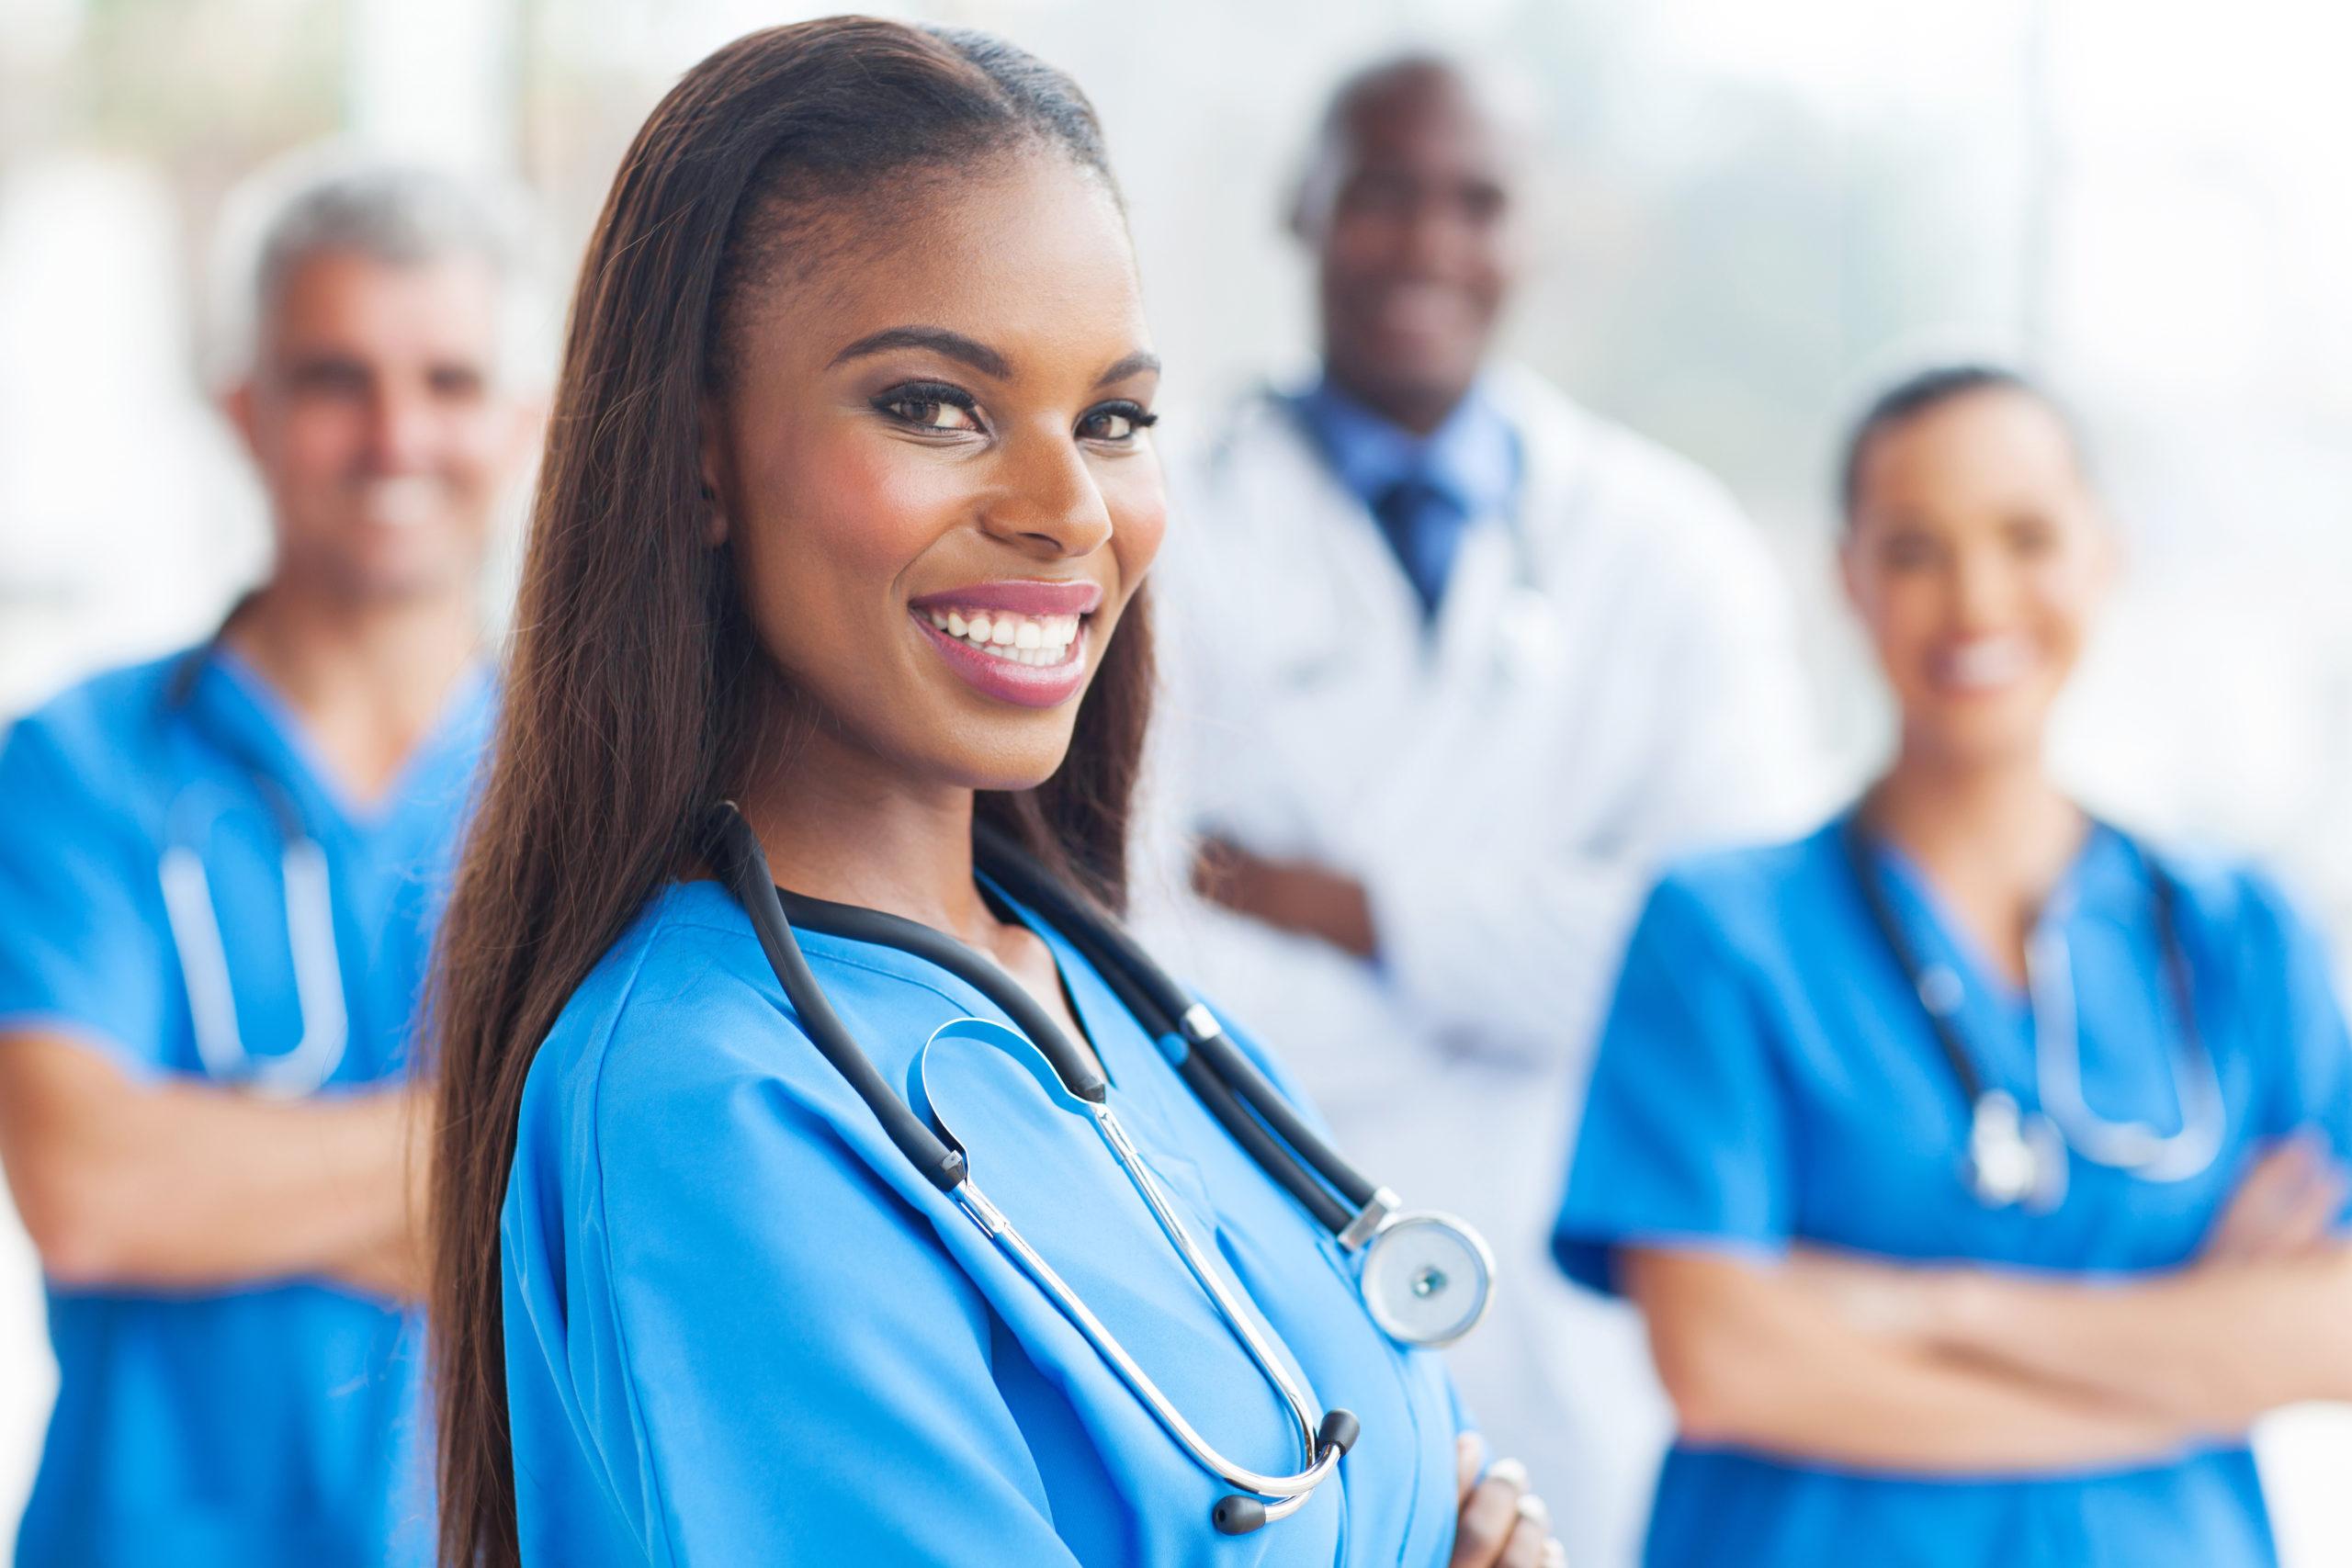 Nurse with a nice smile